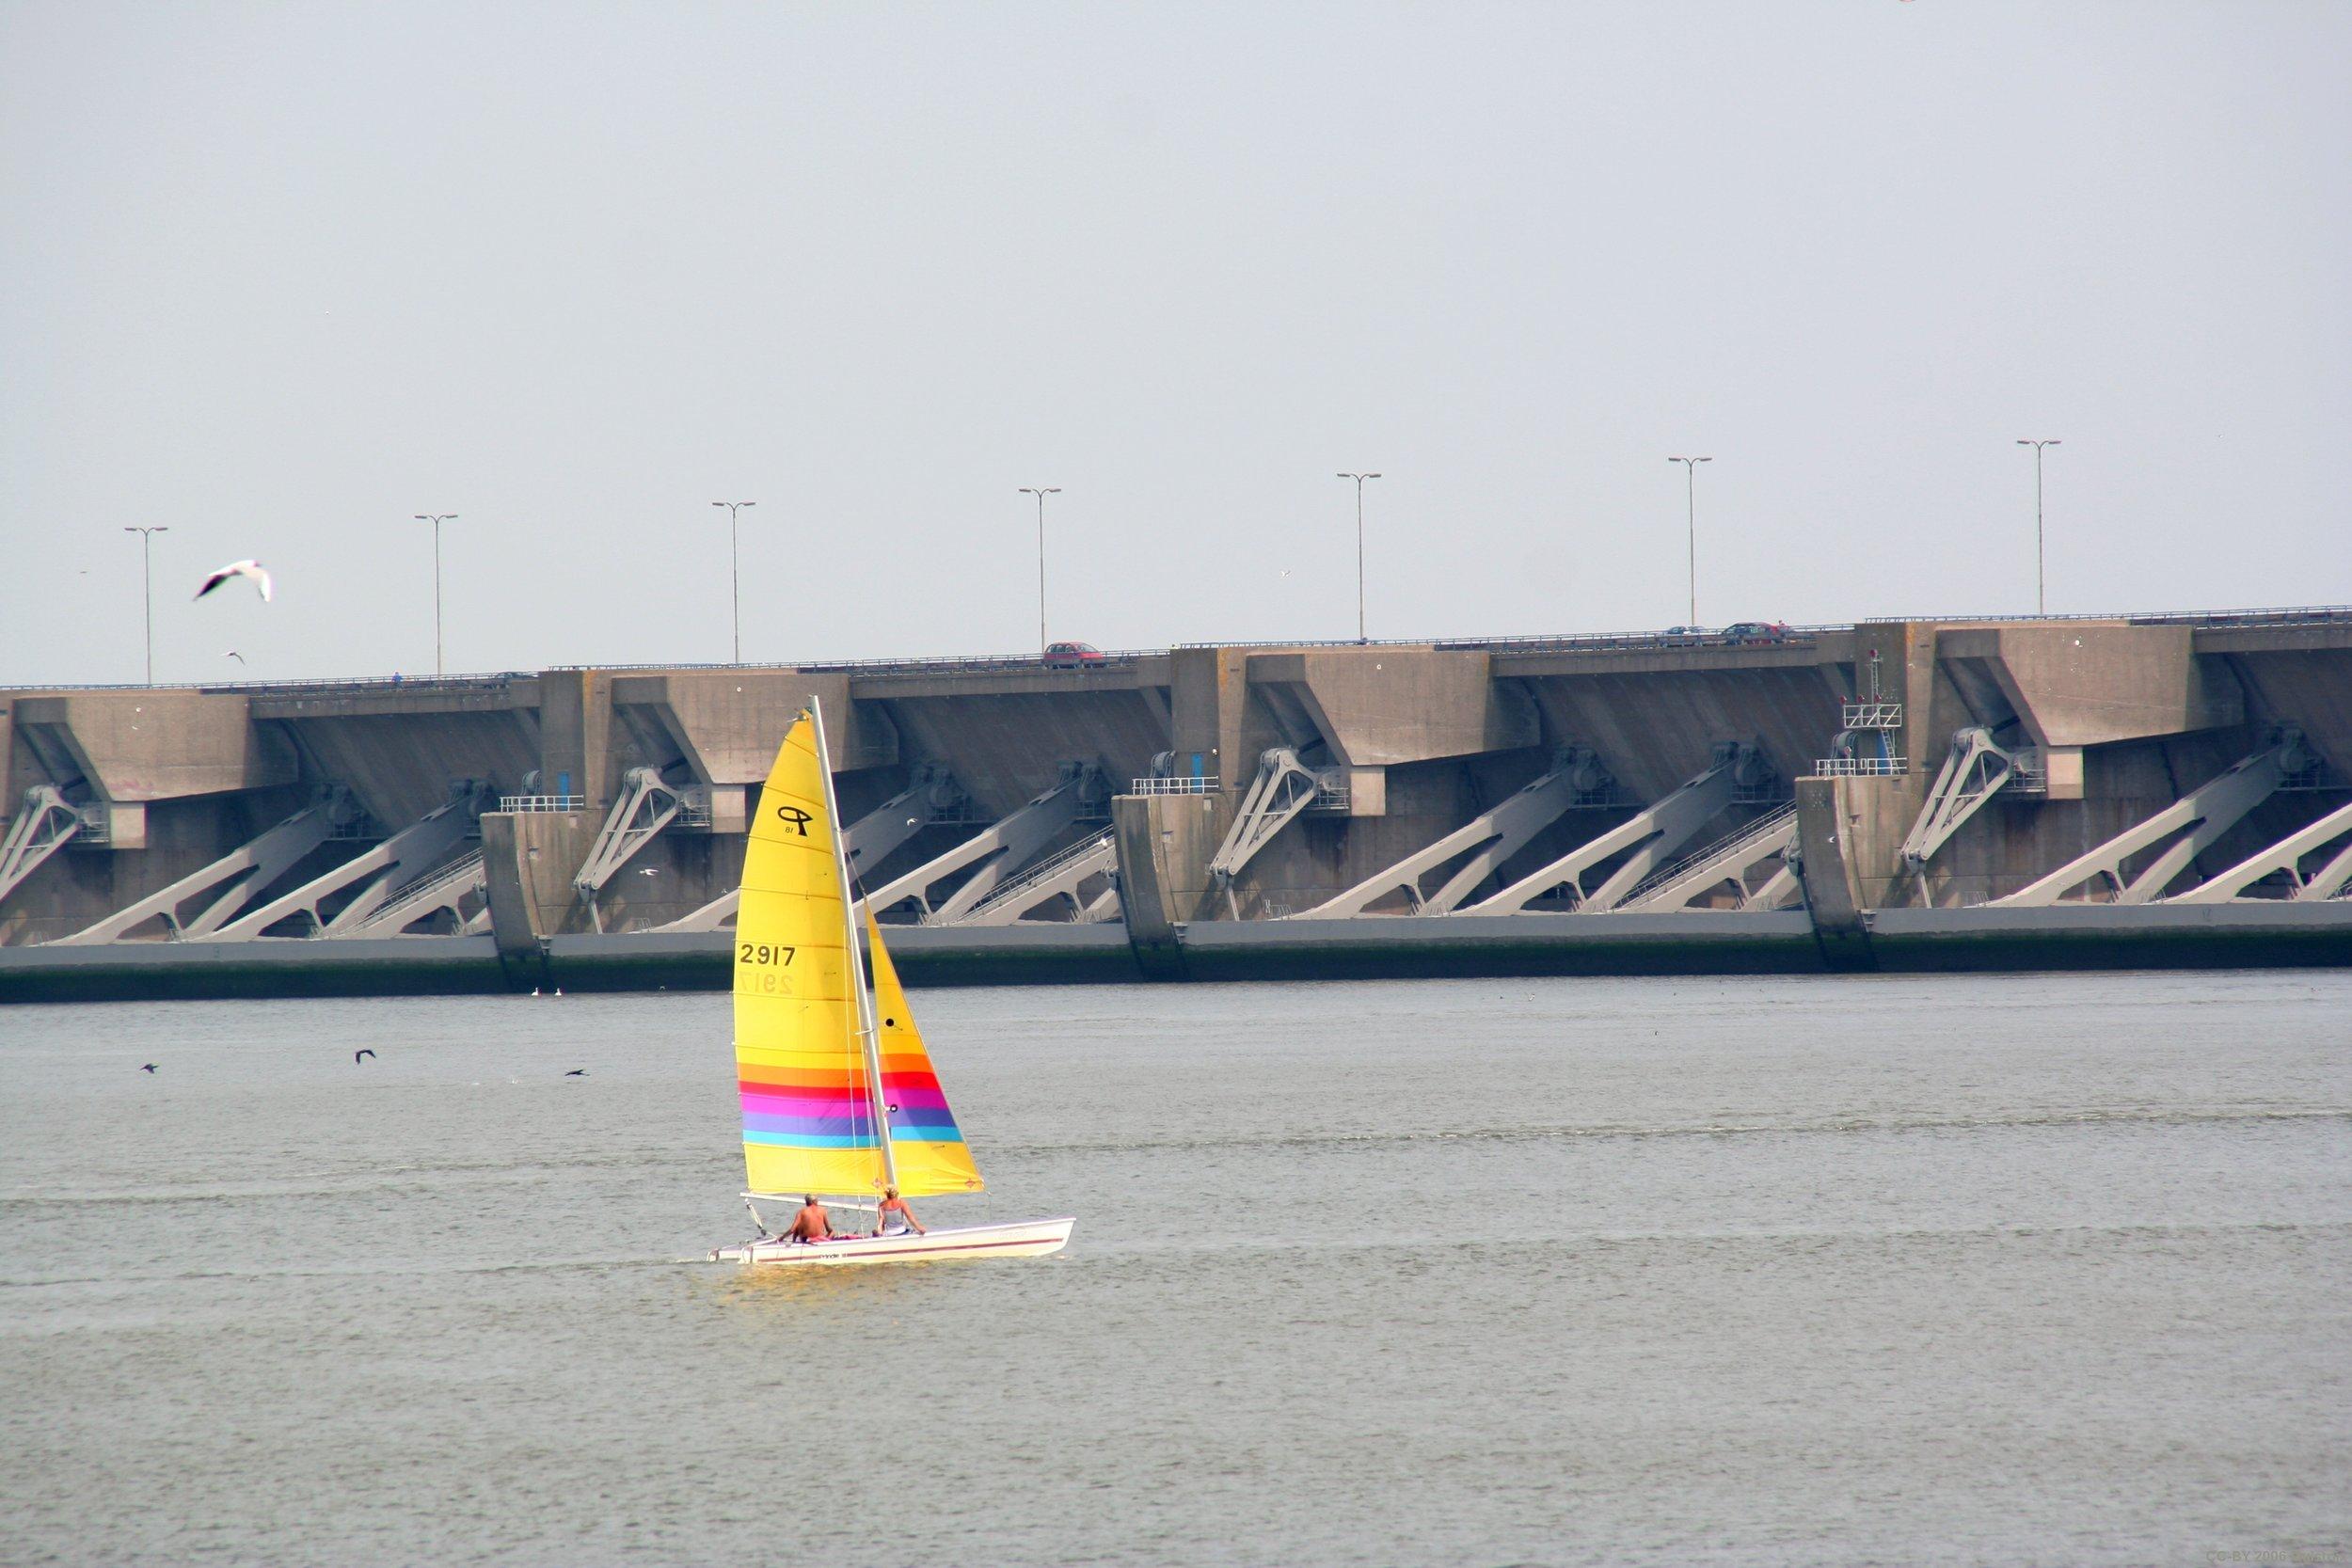 Haringvliet Dam: stock photo taken from Google